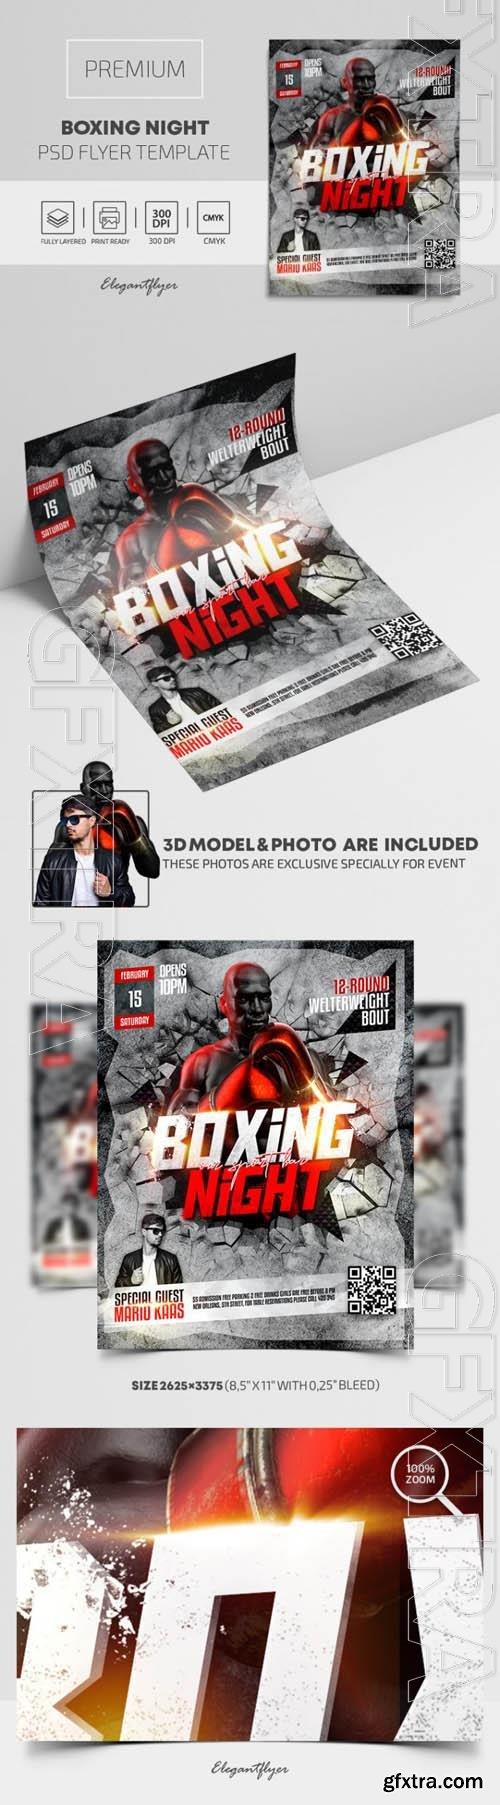 Boxing Night Premium PSD Flyer Template vol 2